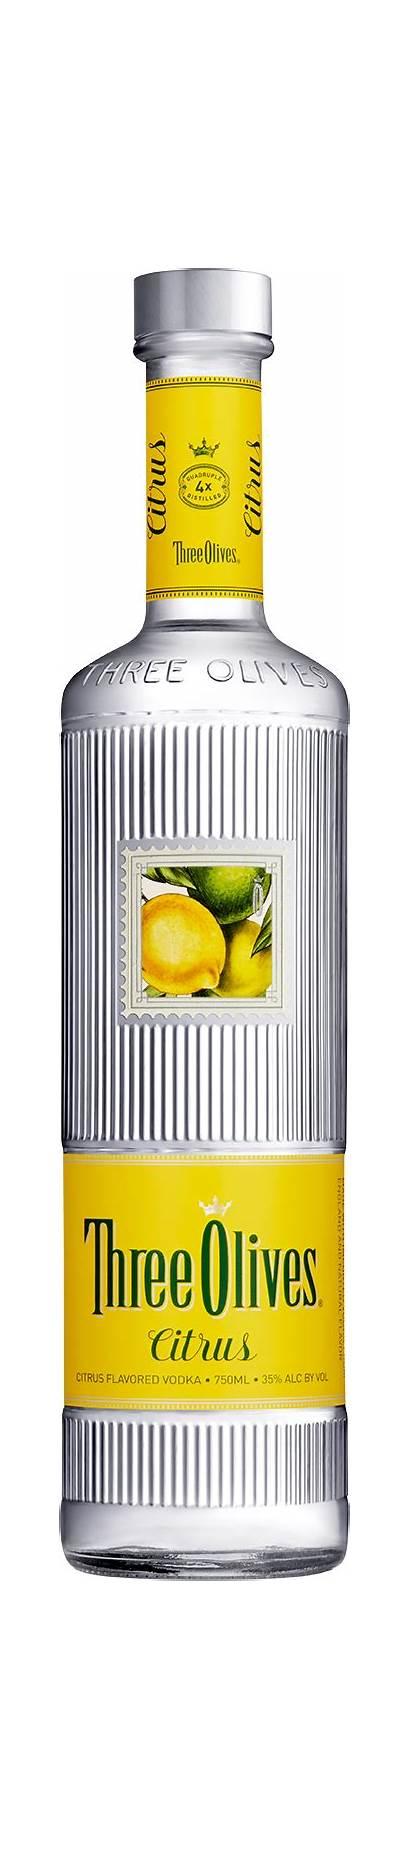 Citrus Olives Three